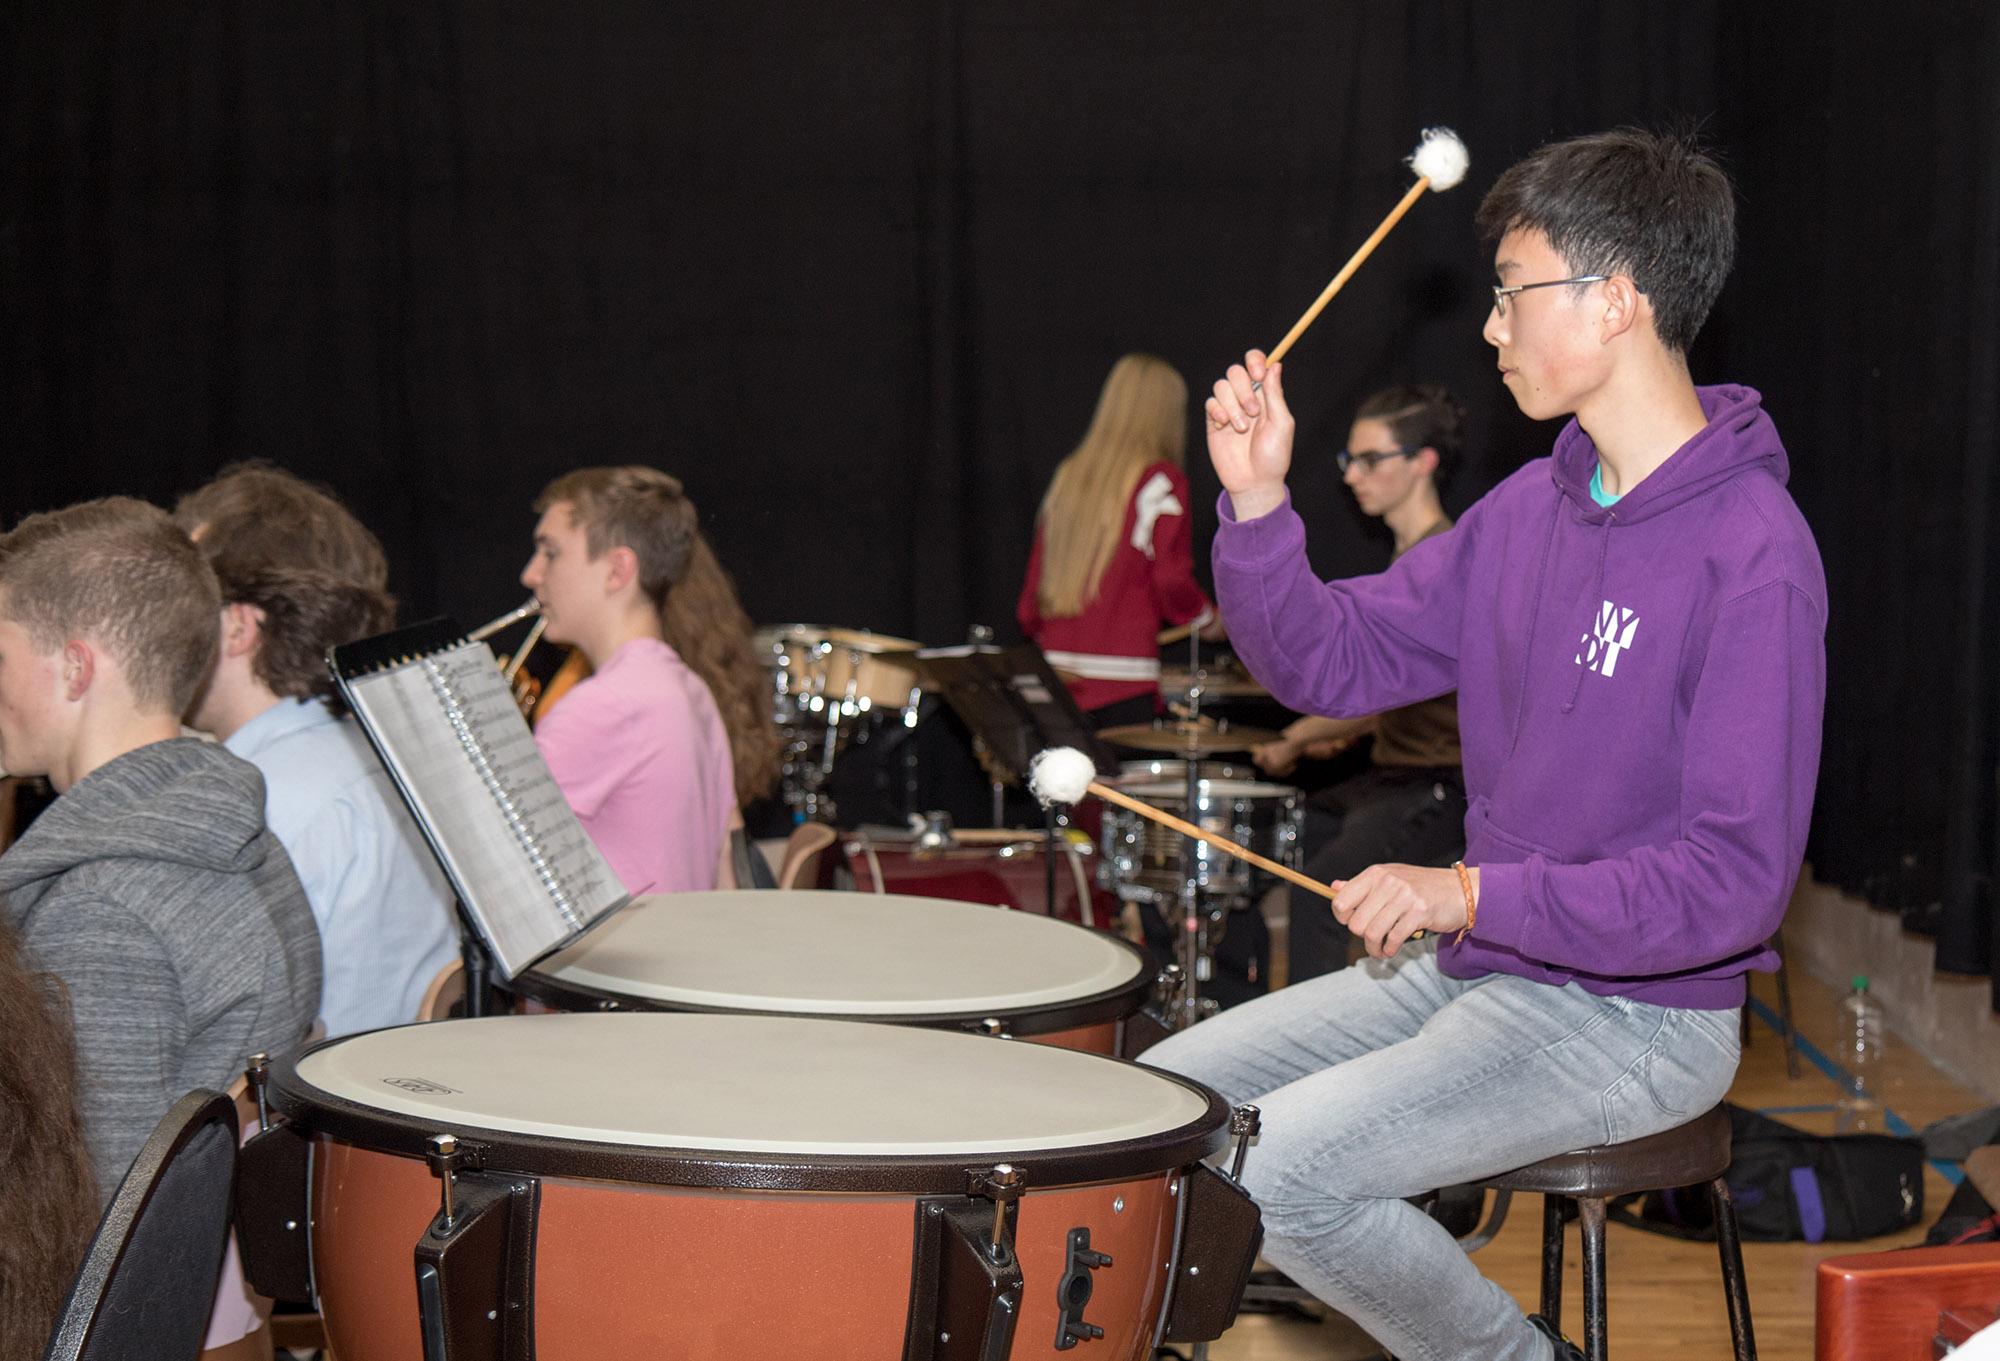 Symphonic Waves Drums - Clonbur Rehearsal